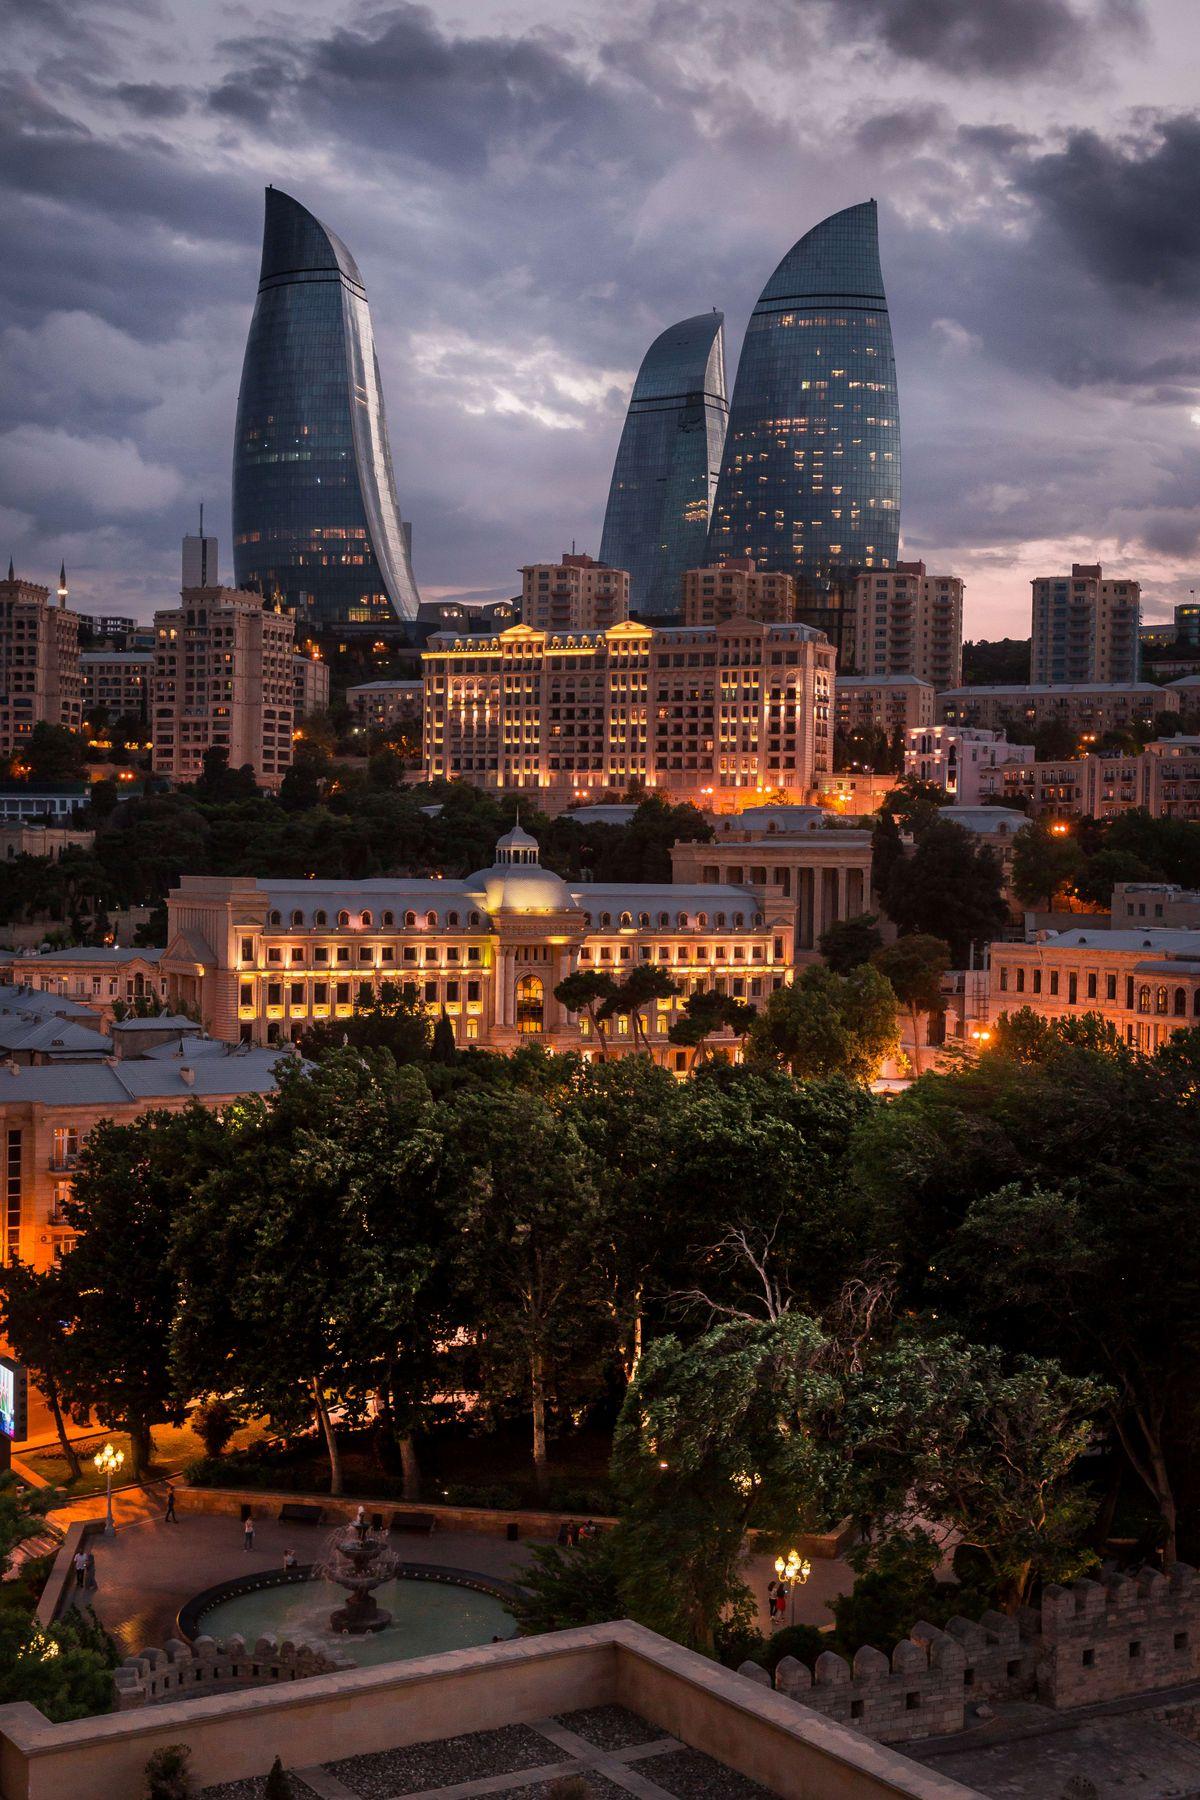 Баку. Вид на Flame Towers баку азербайджан небоскреб город пейзаж городской вечер закат вечерний